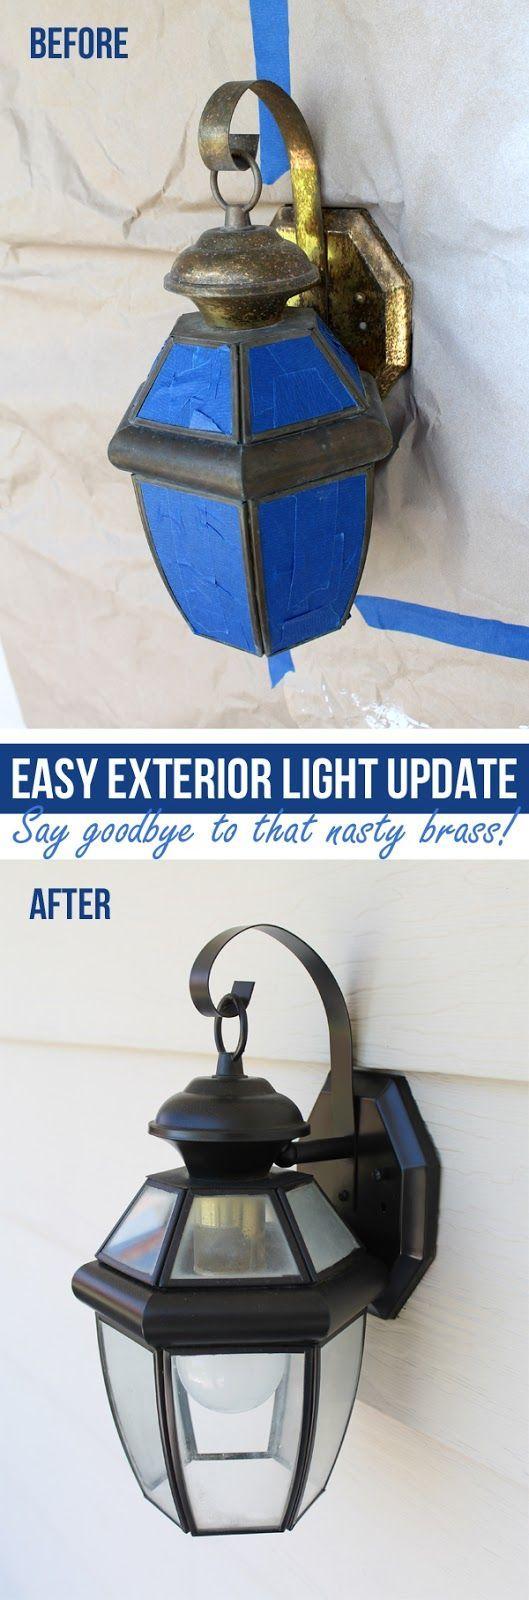 Refinishing Light Fixtures